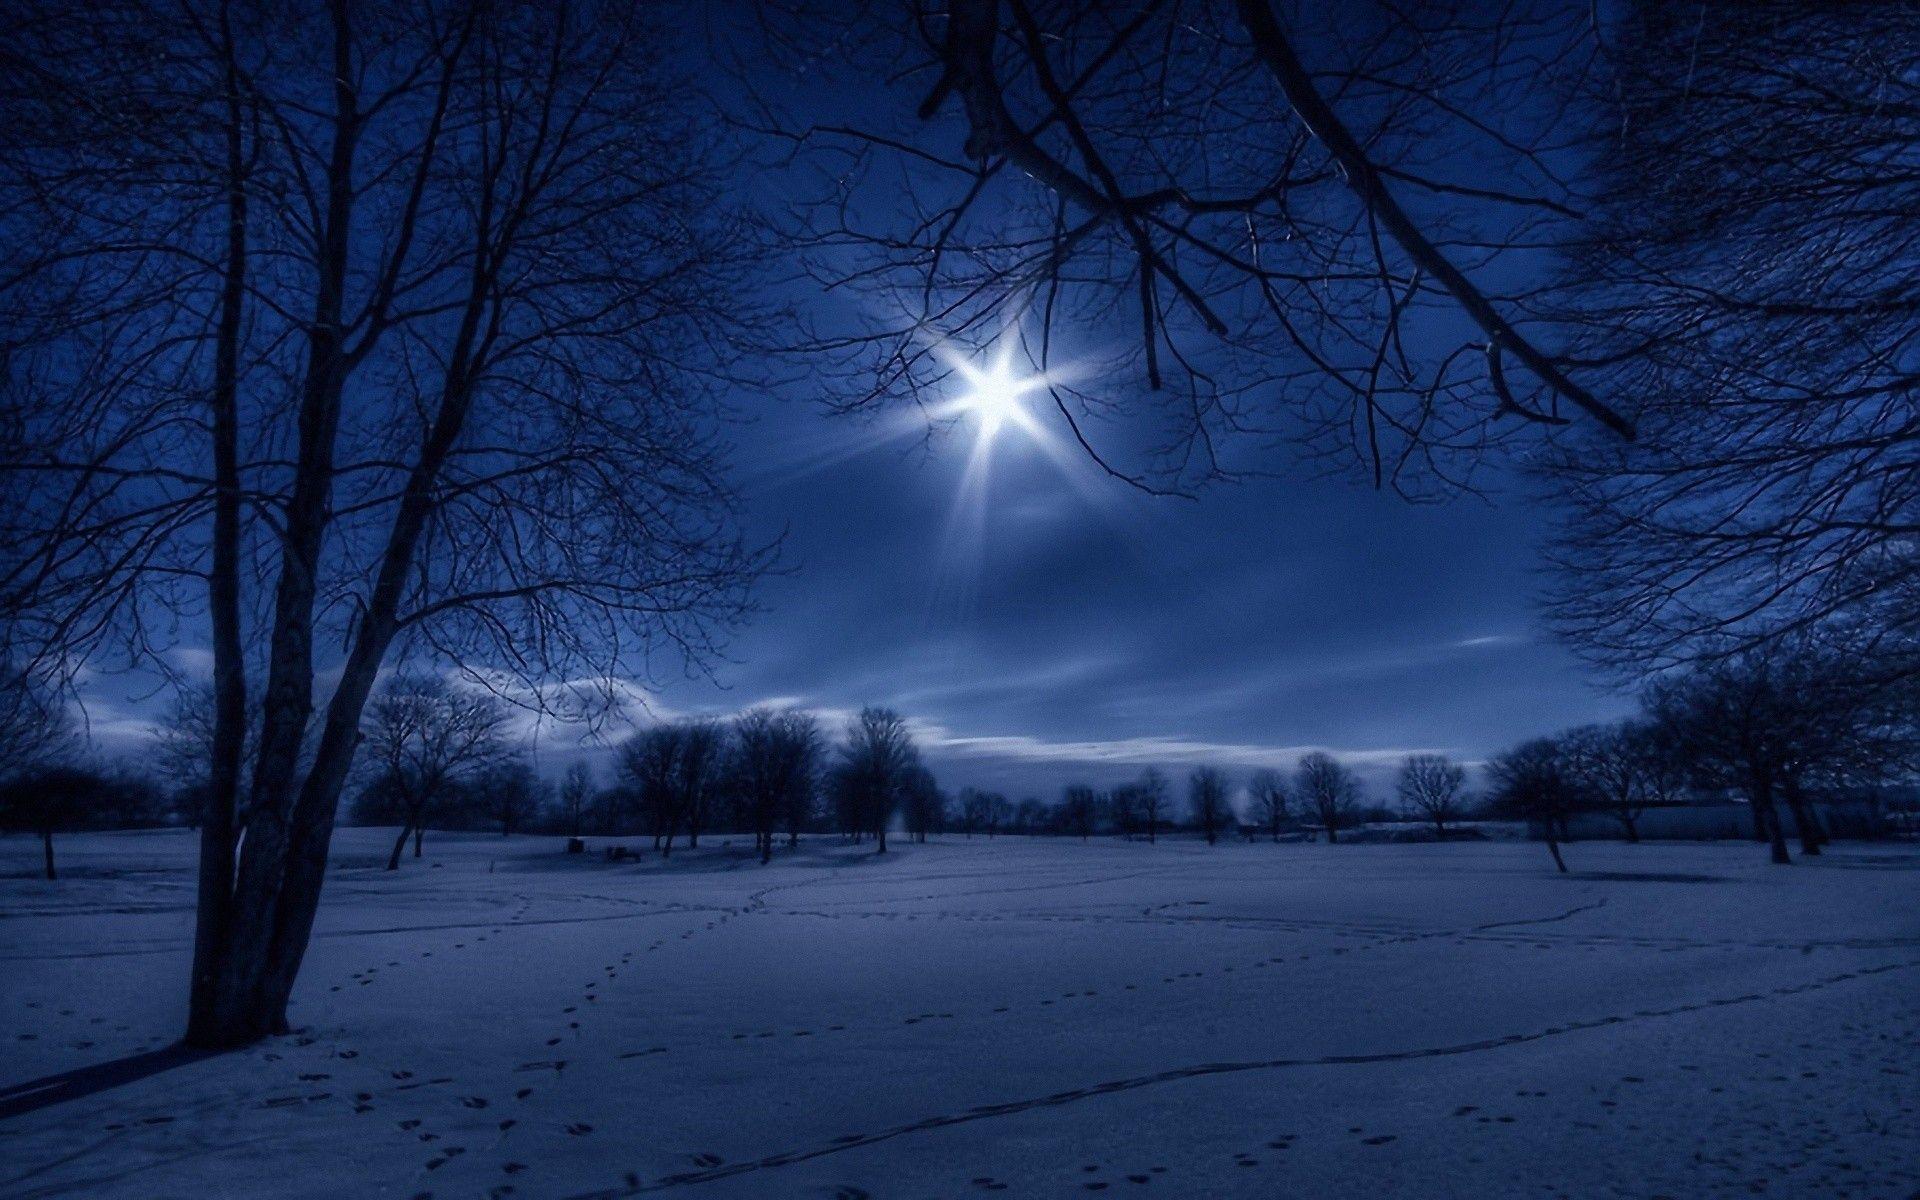 moonlit night~ | winter night, moonlight and winter wallpapers